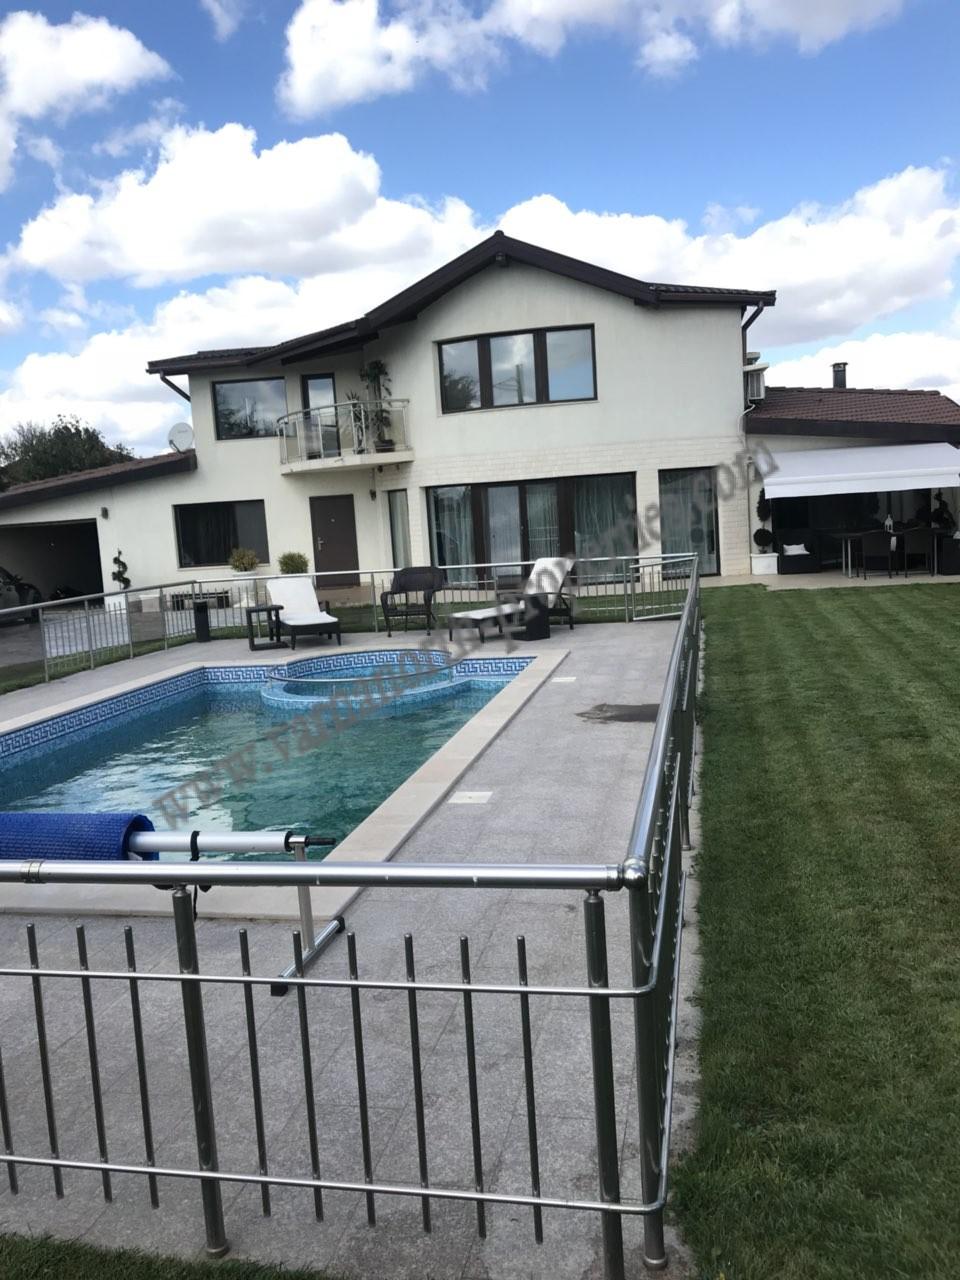 New, modern house